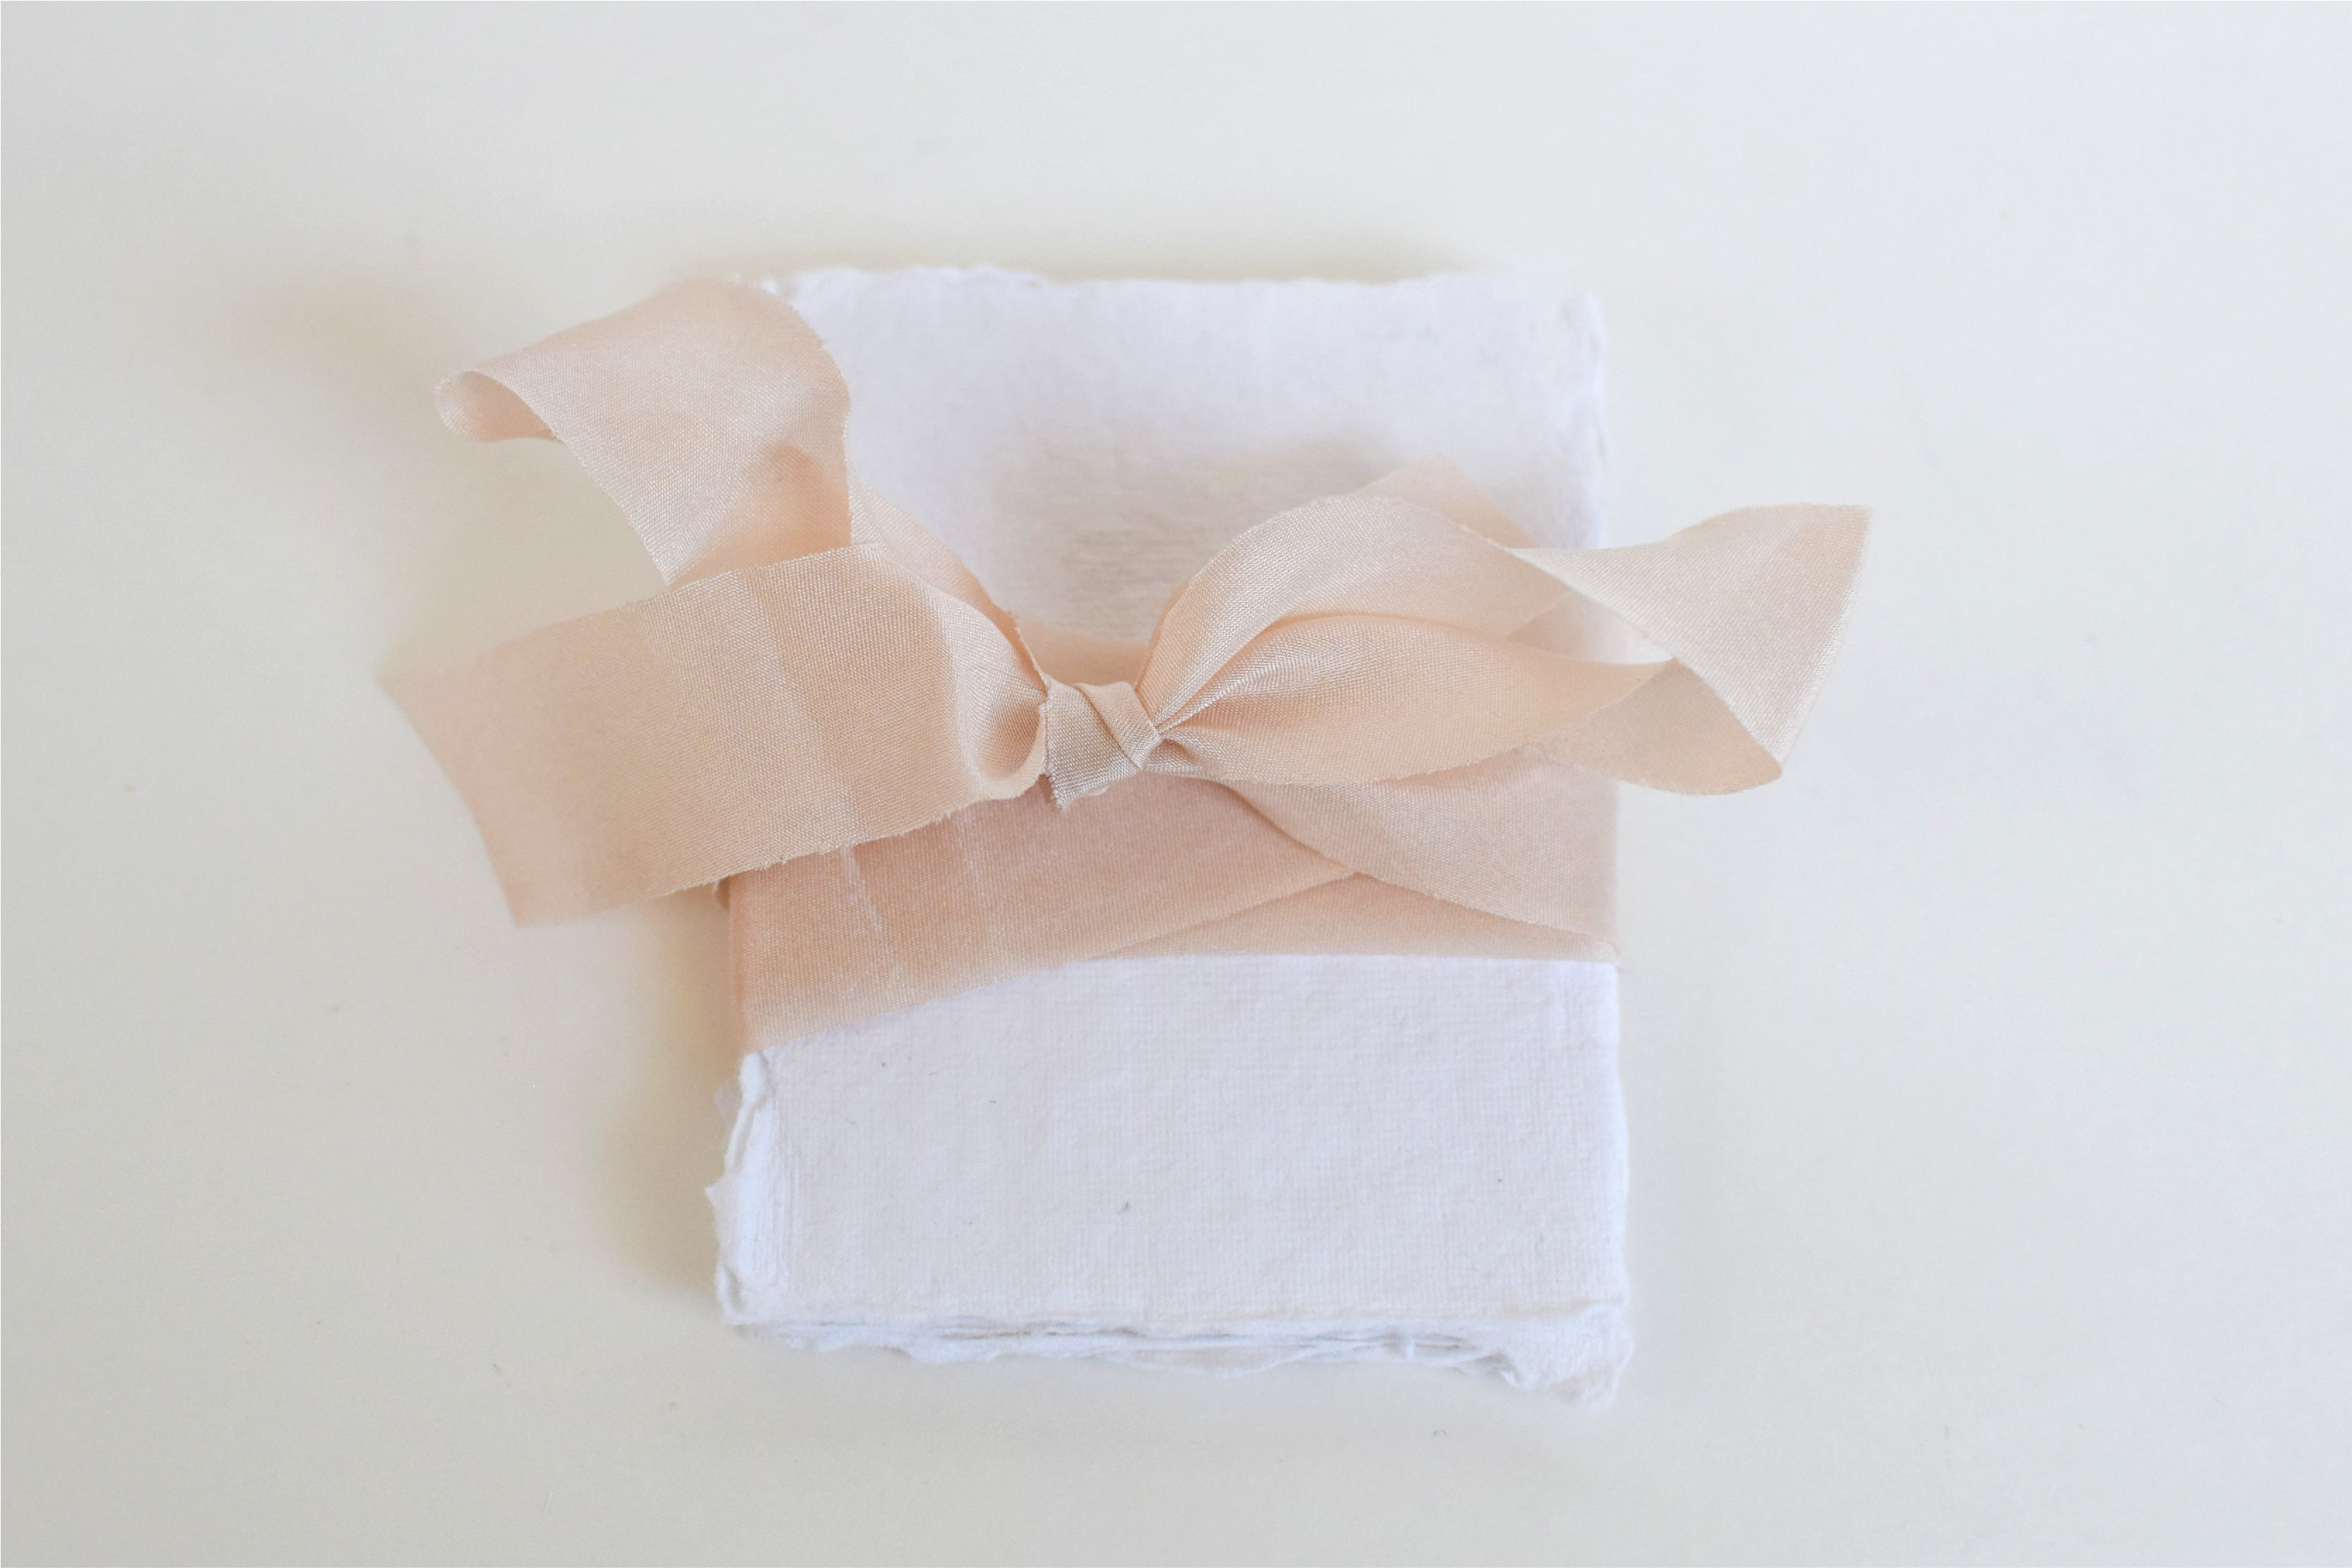 "Handmade paper 2.5""x3.5""(6.3x8.9cm) 150gsm 5枚入"